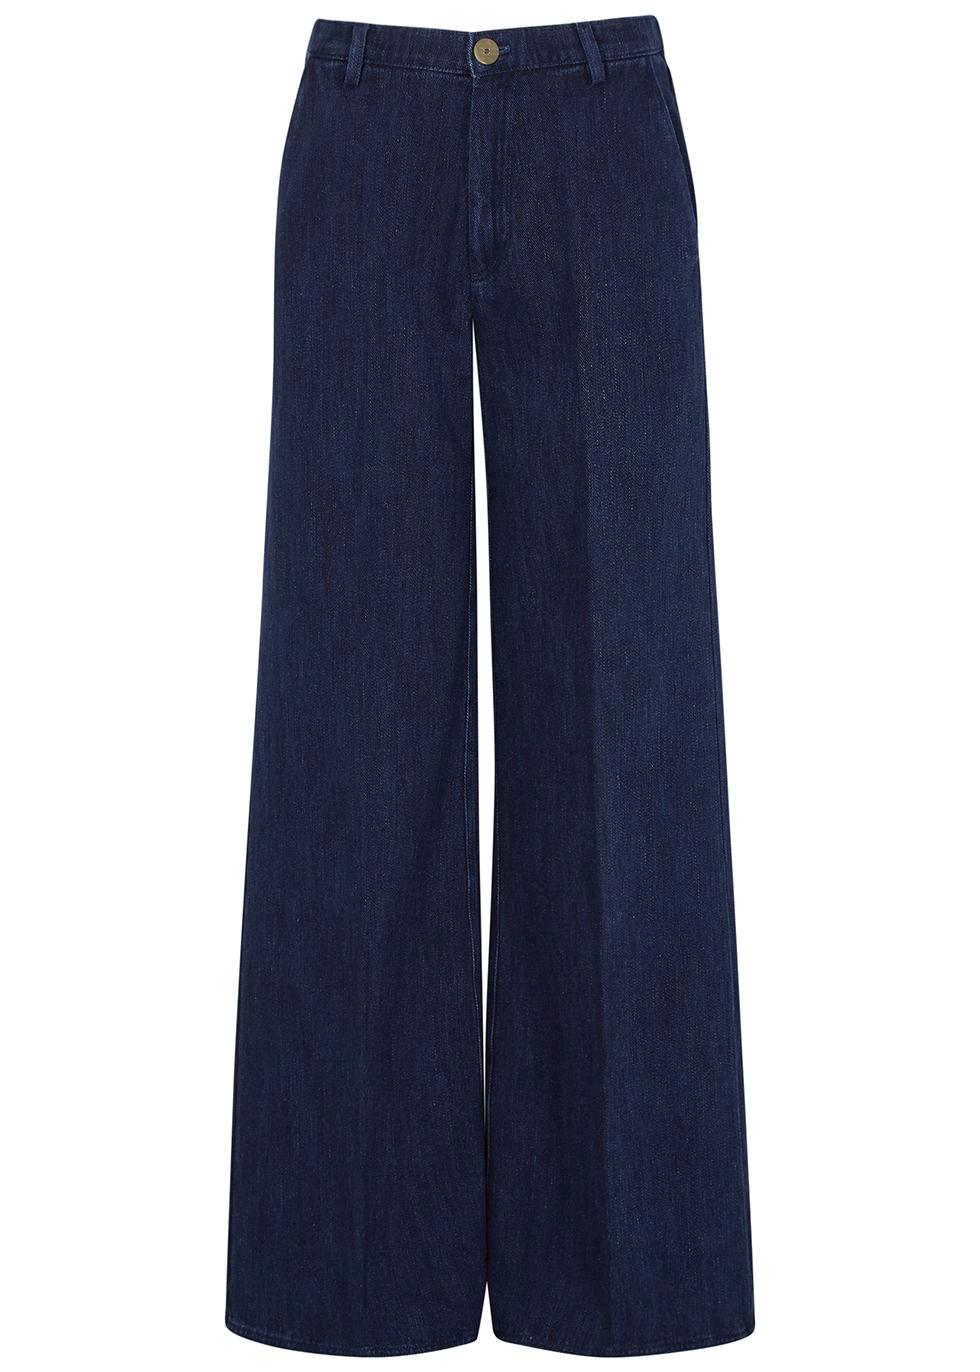 Dark blue wide-leg jeans